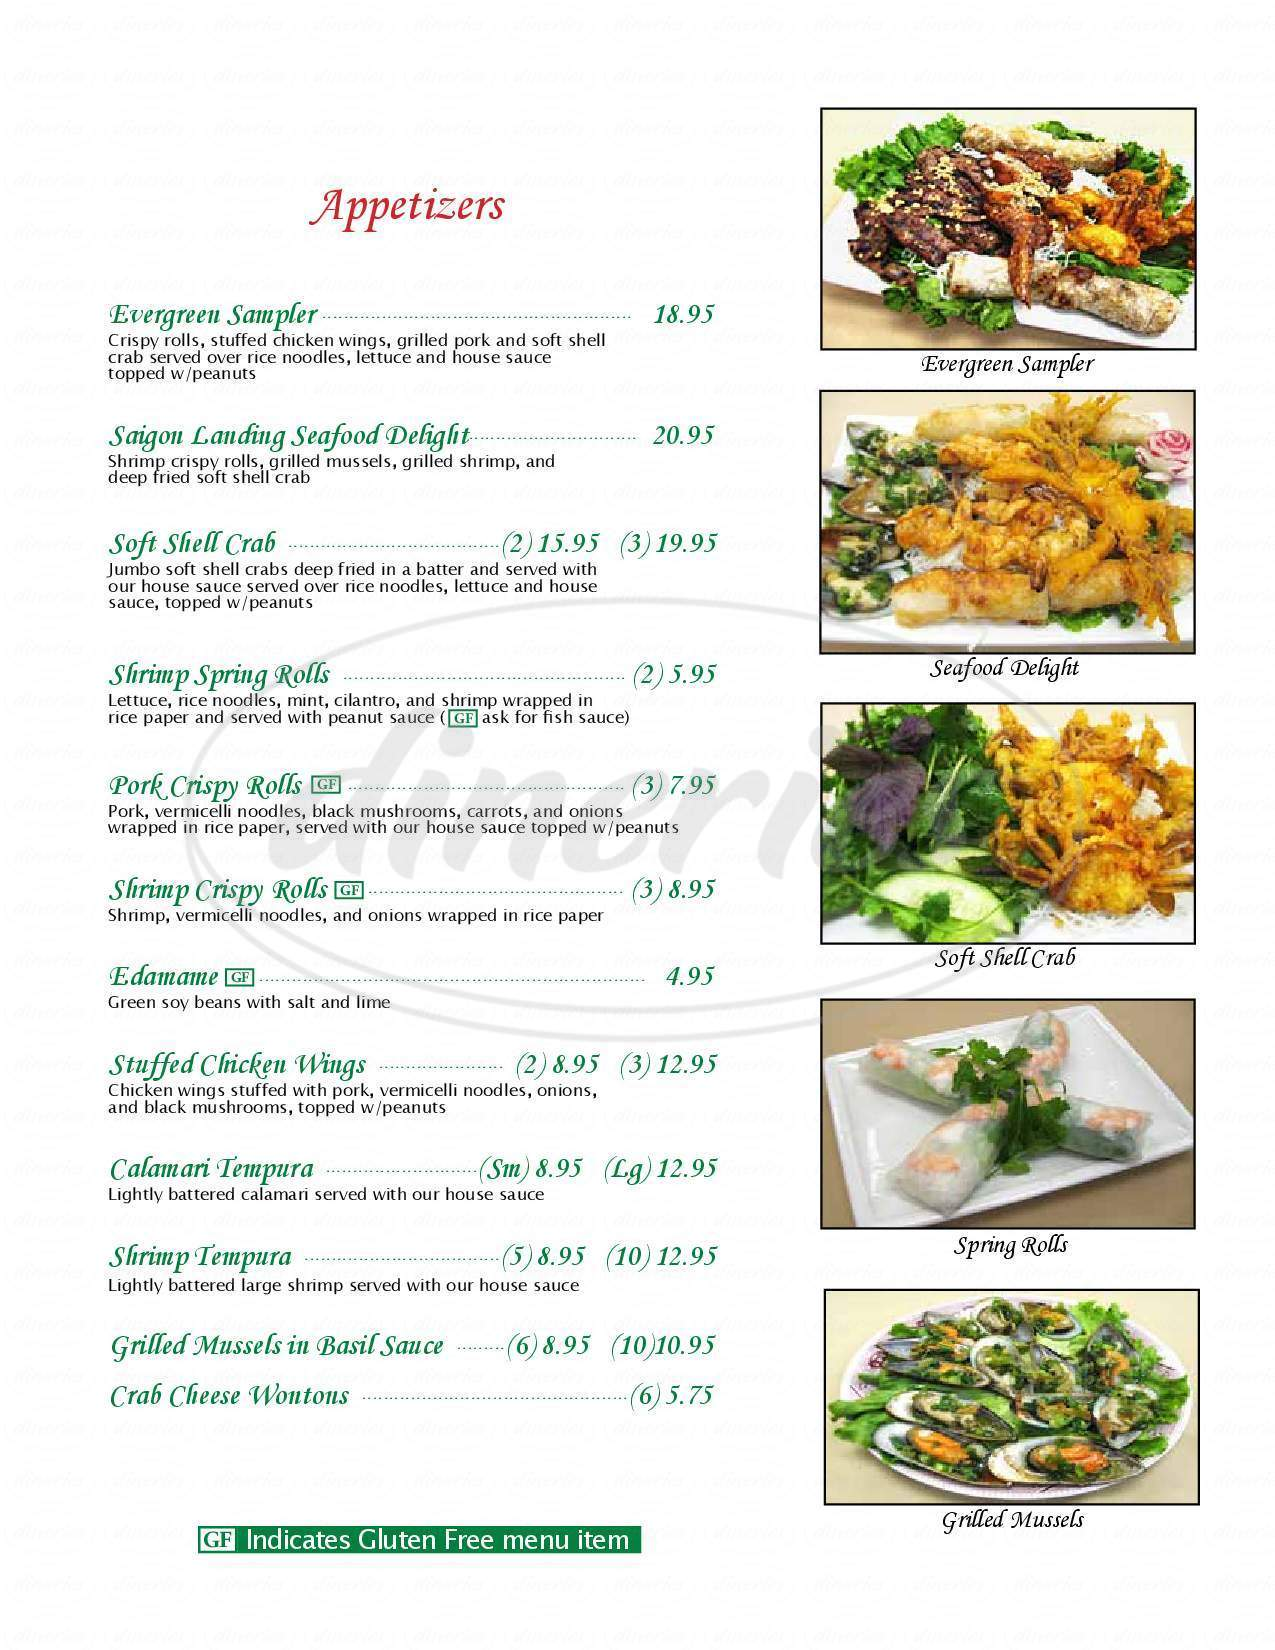 menu for Saigon Landing